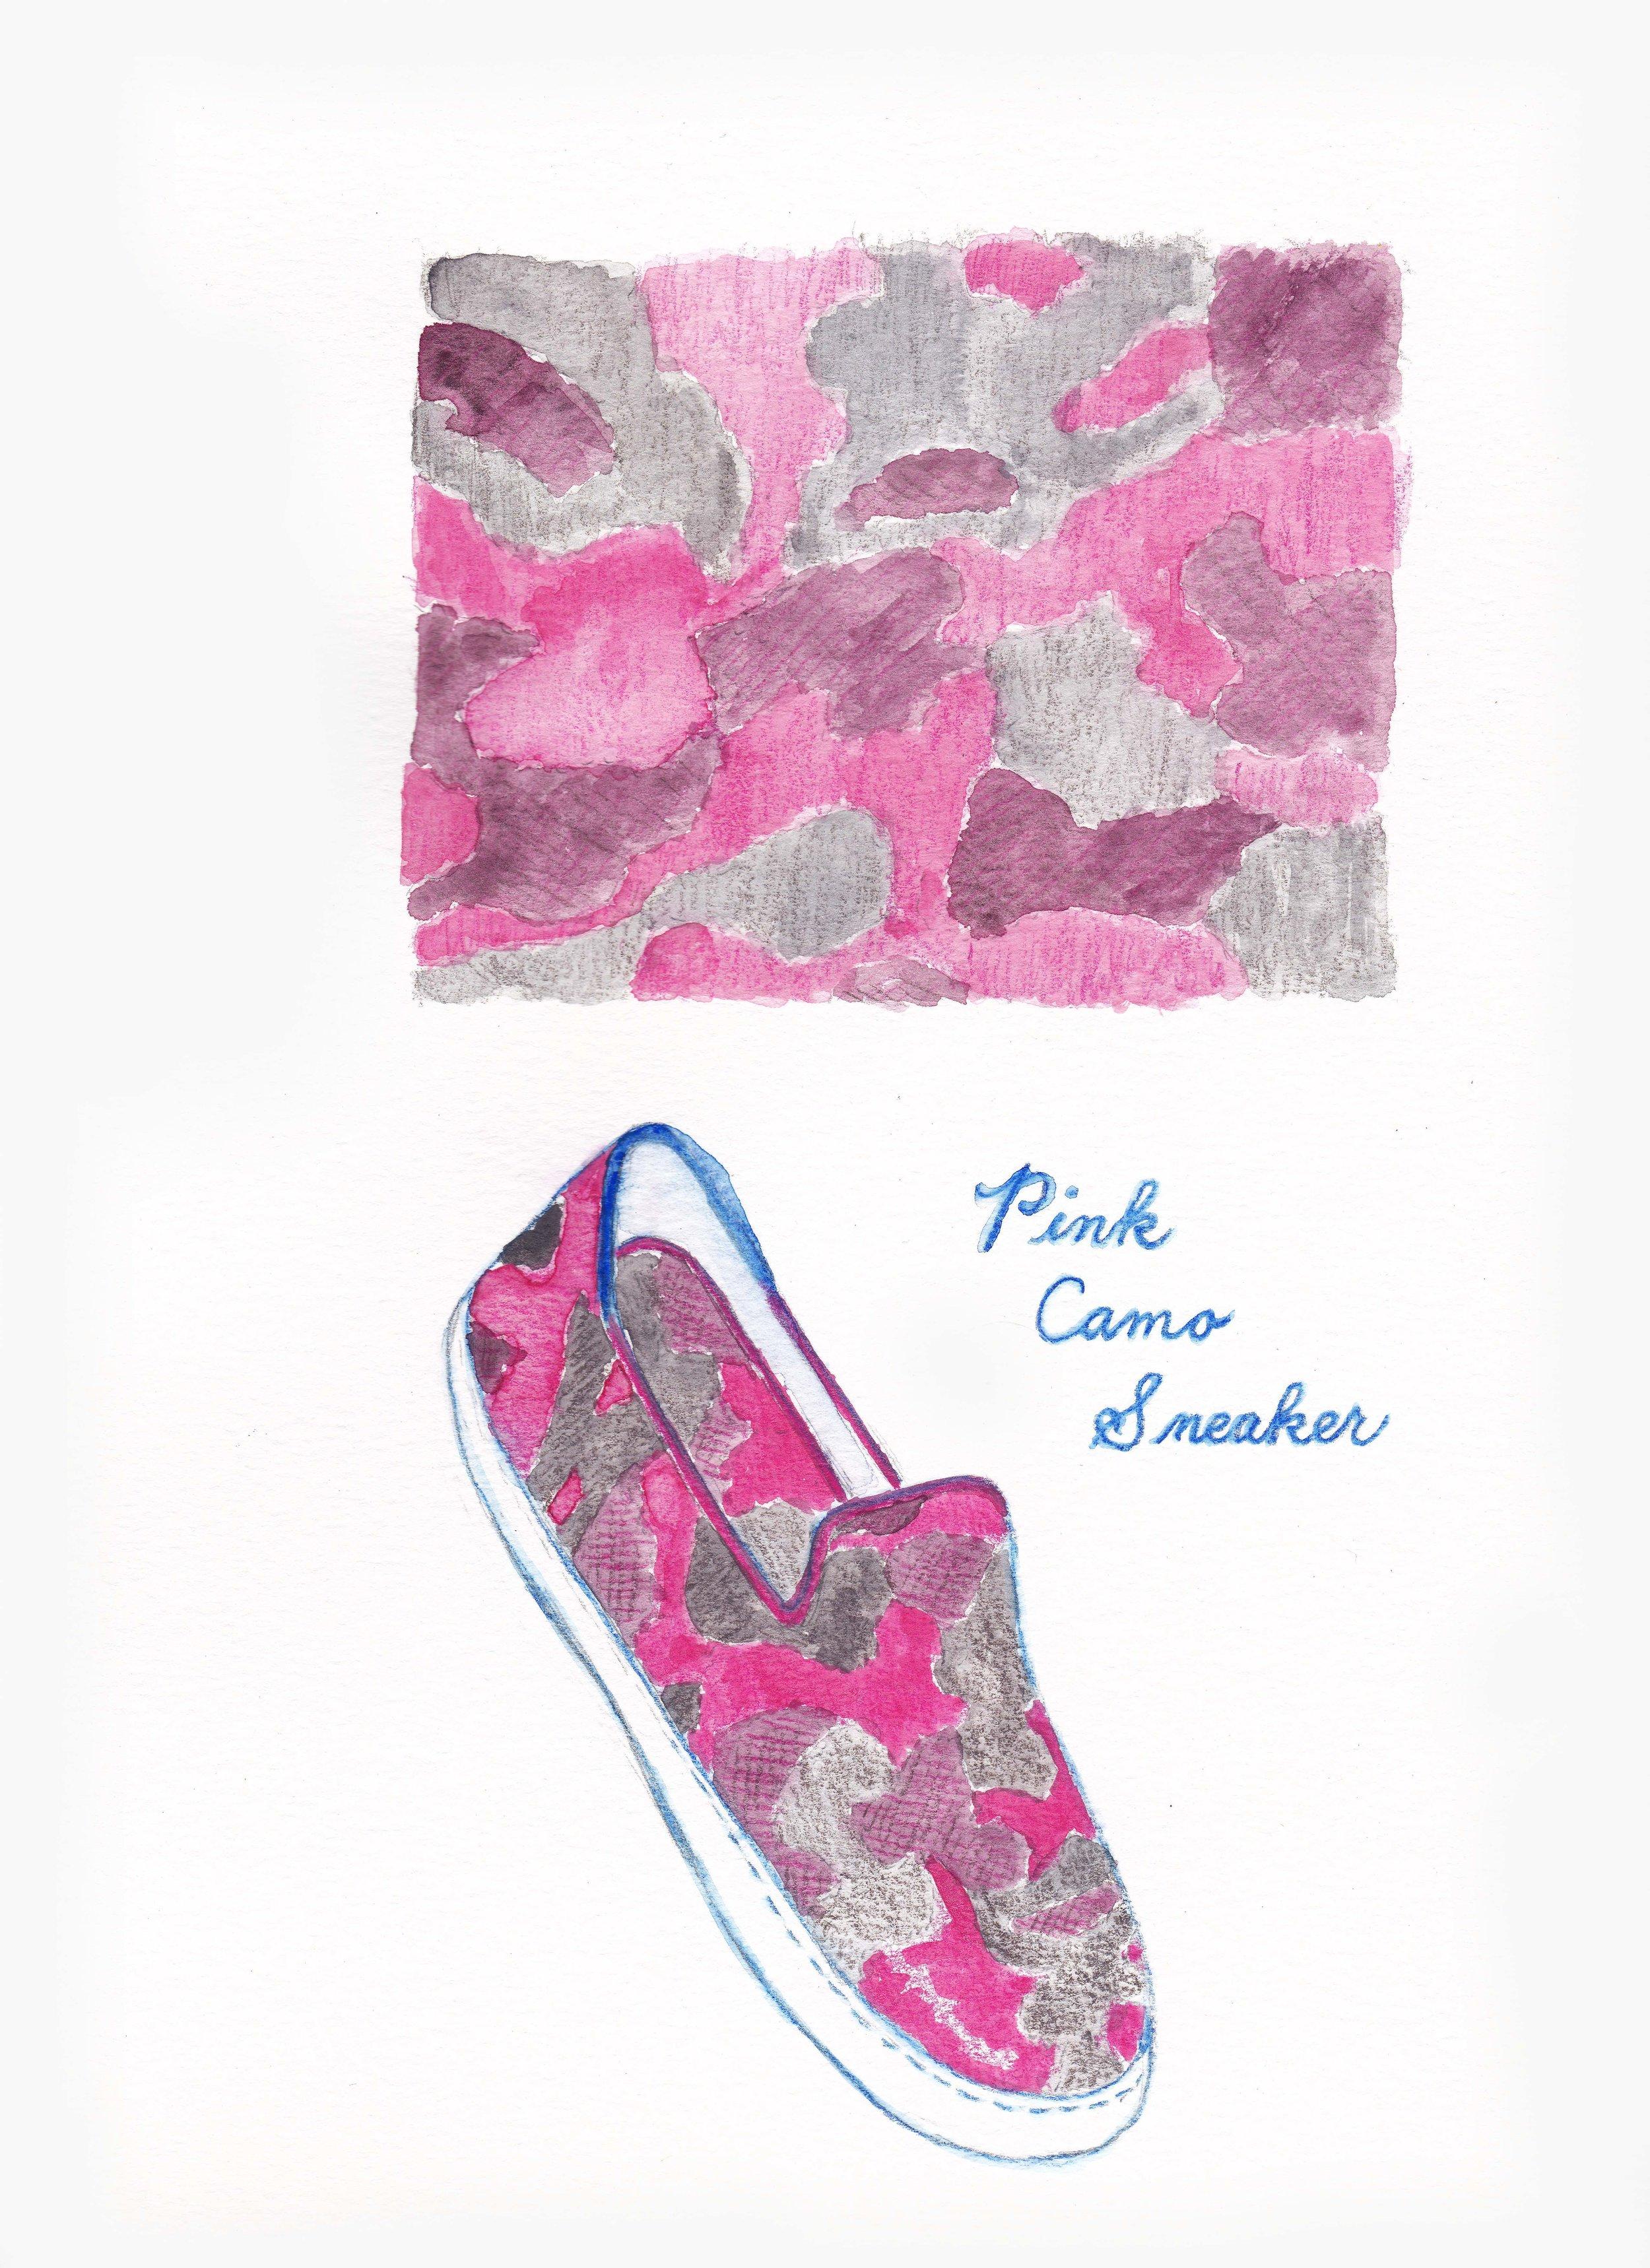 Laura Ann_Rothys_Pink Camo Sneaker.jpg